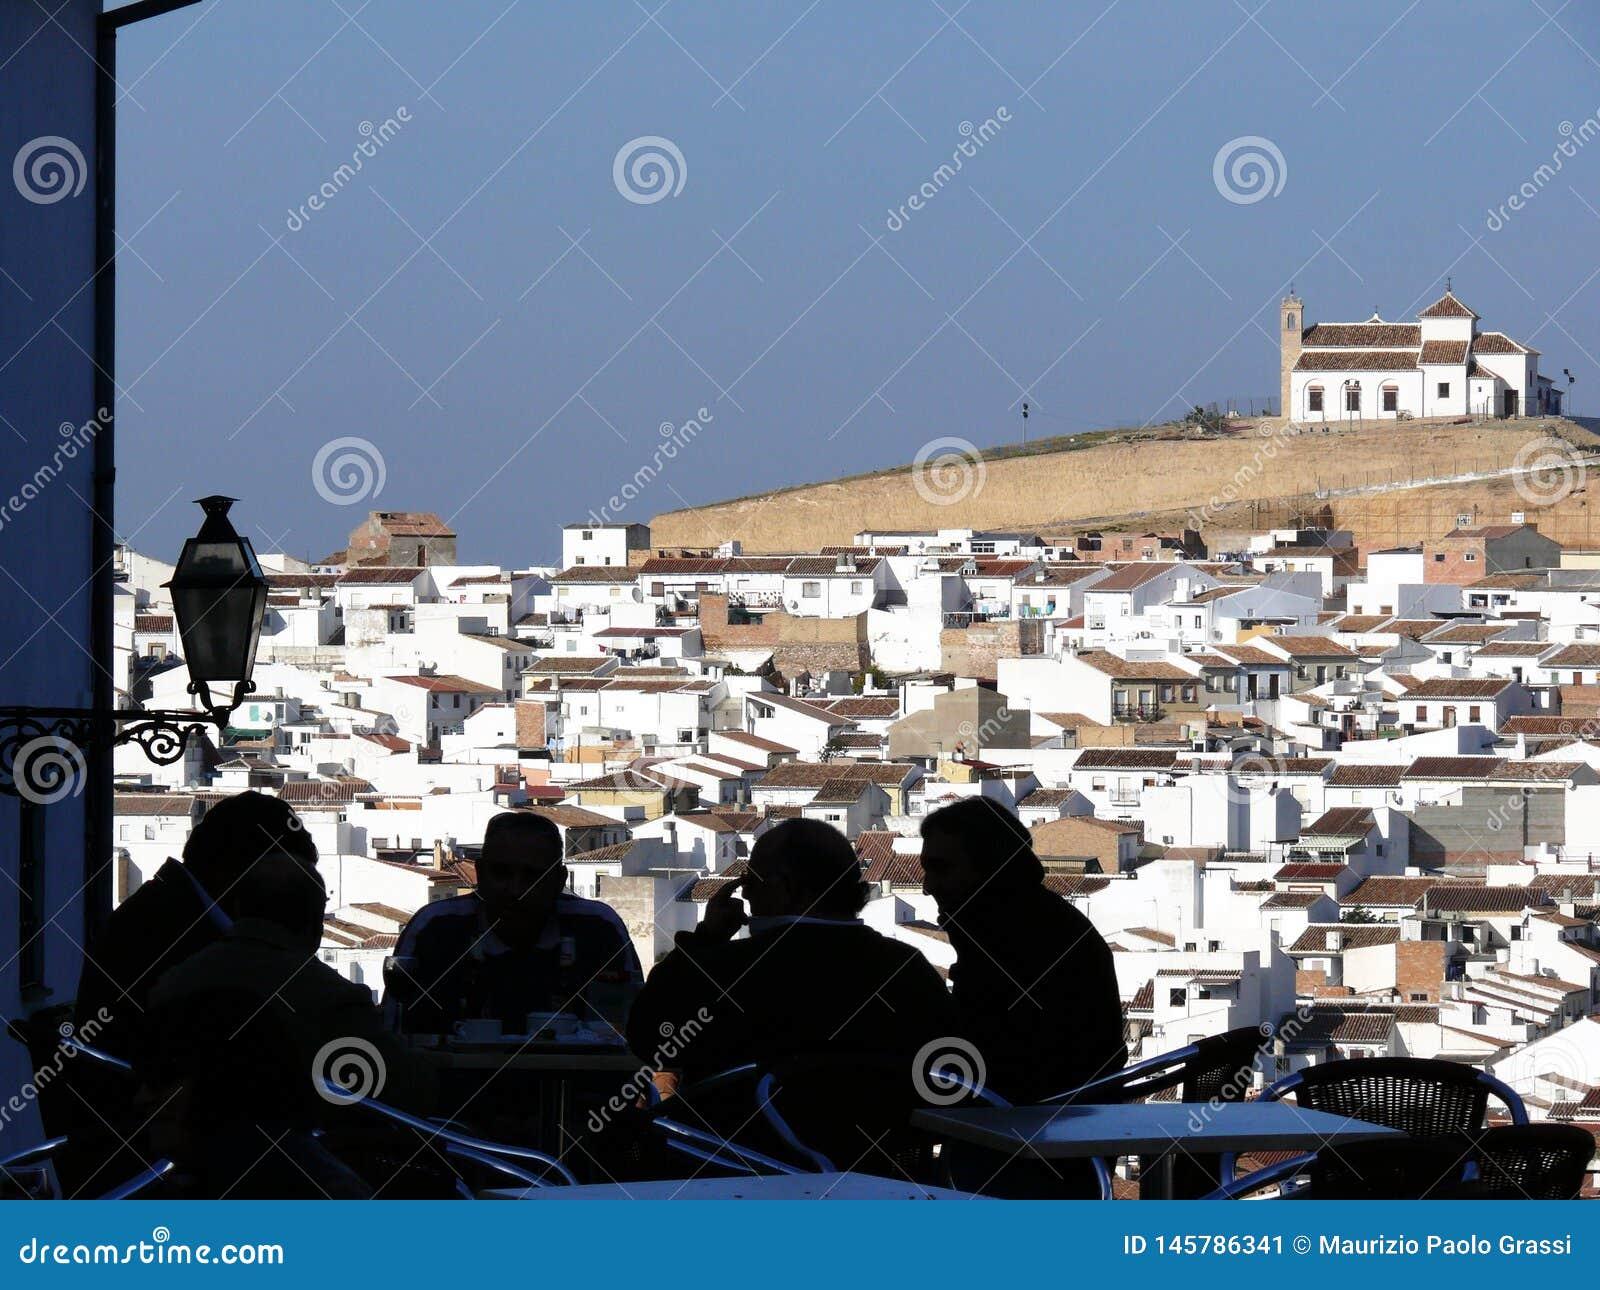 V?nner f?r archeological bakgrundsstad bild f?r kull f?r andalusia antequera visar viktiga mer n?ra en panorama- rocklokal spain